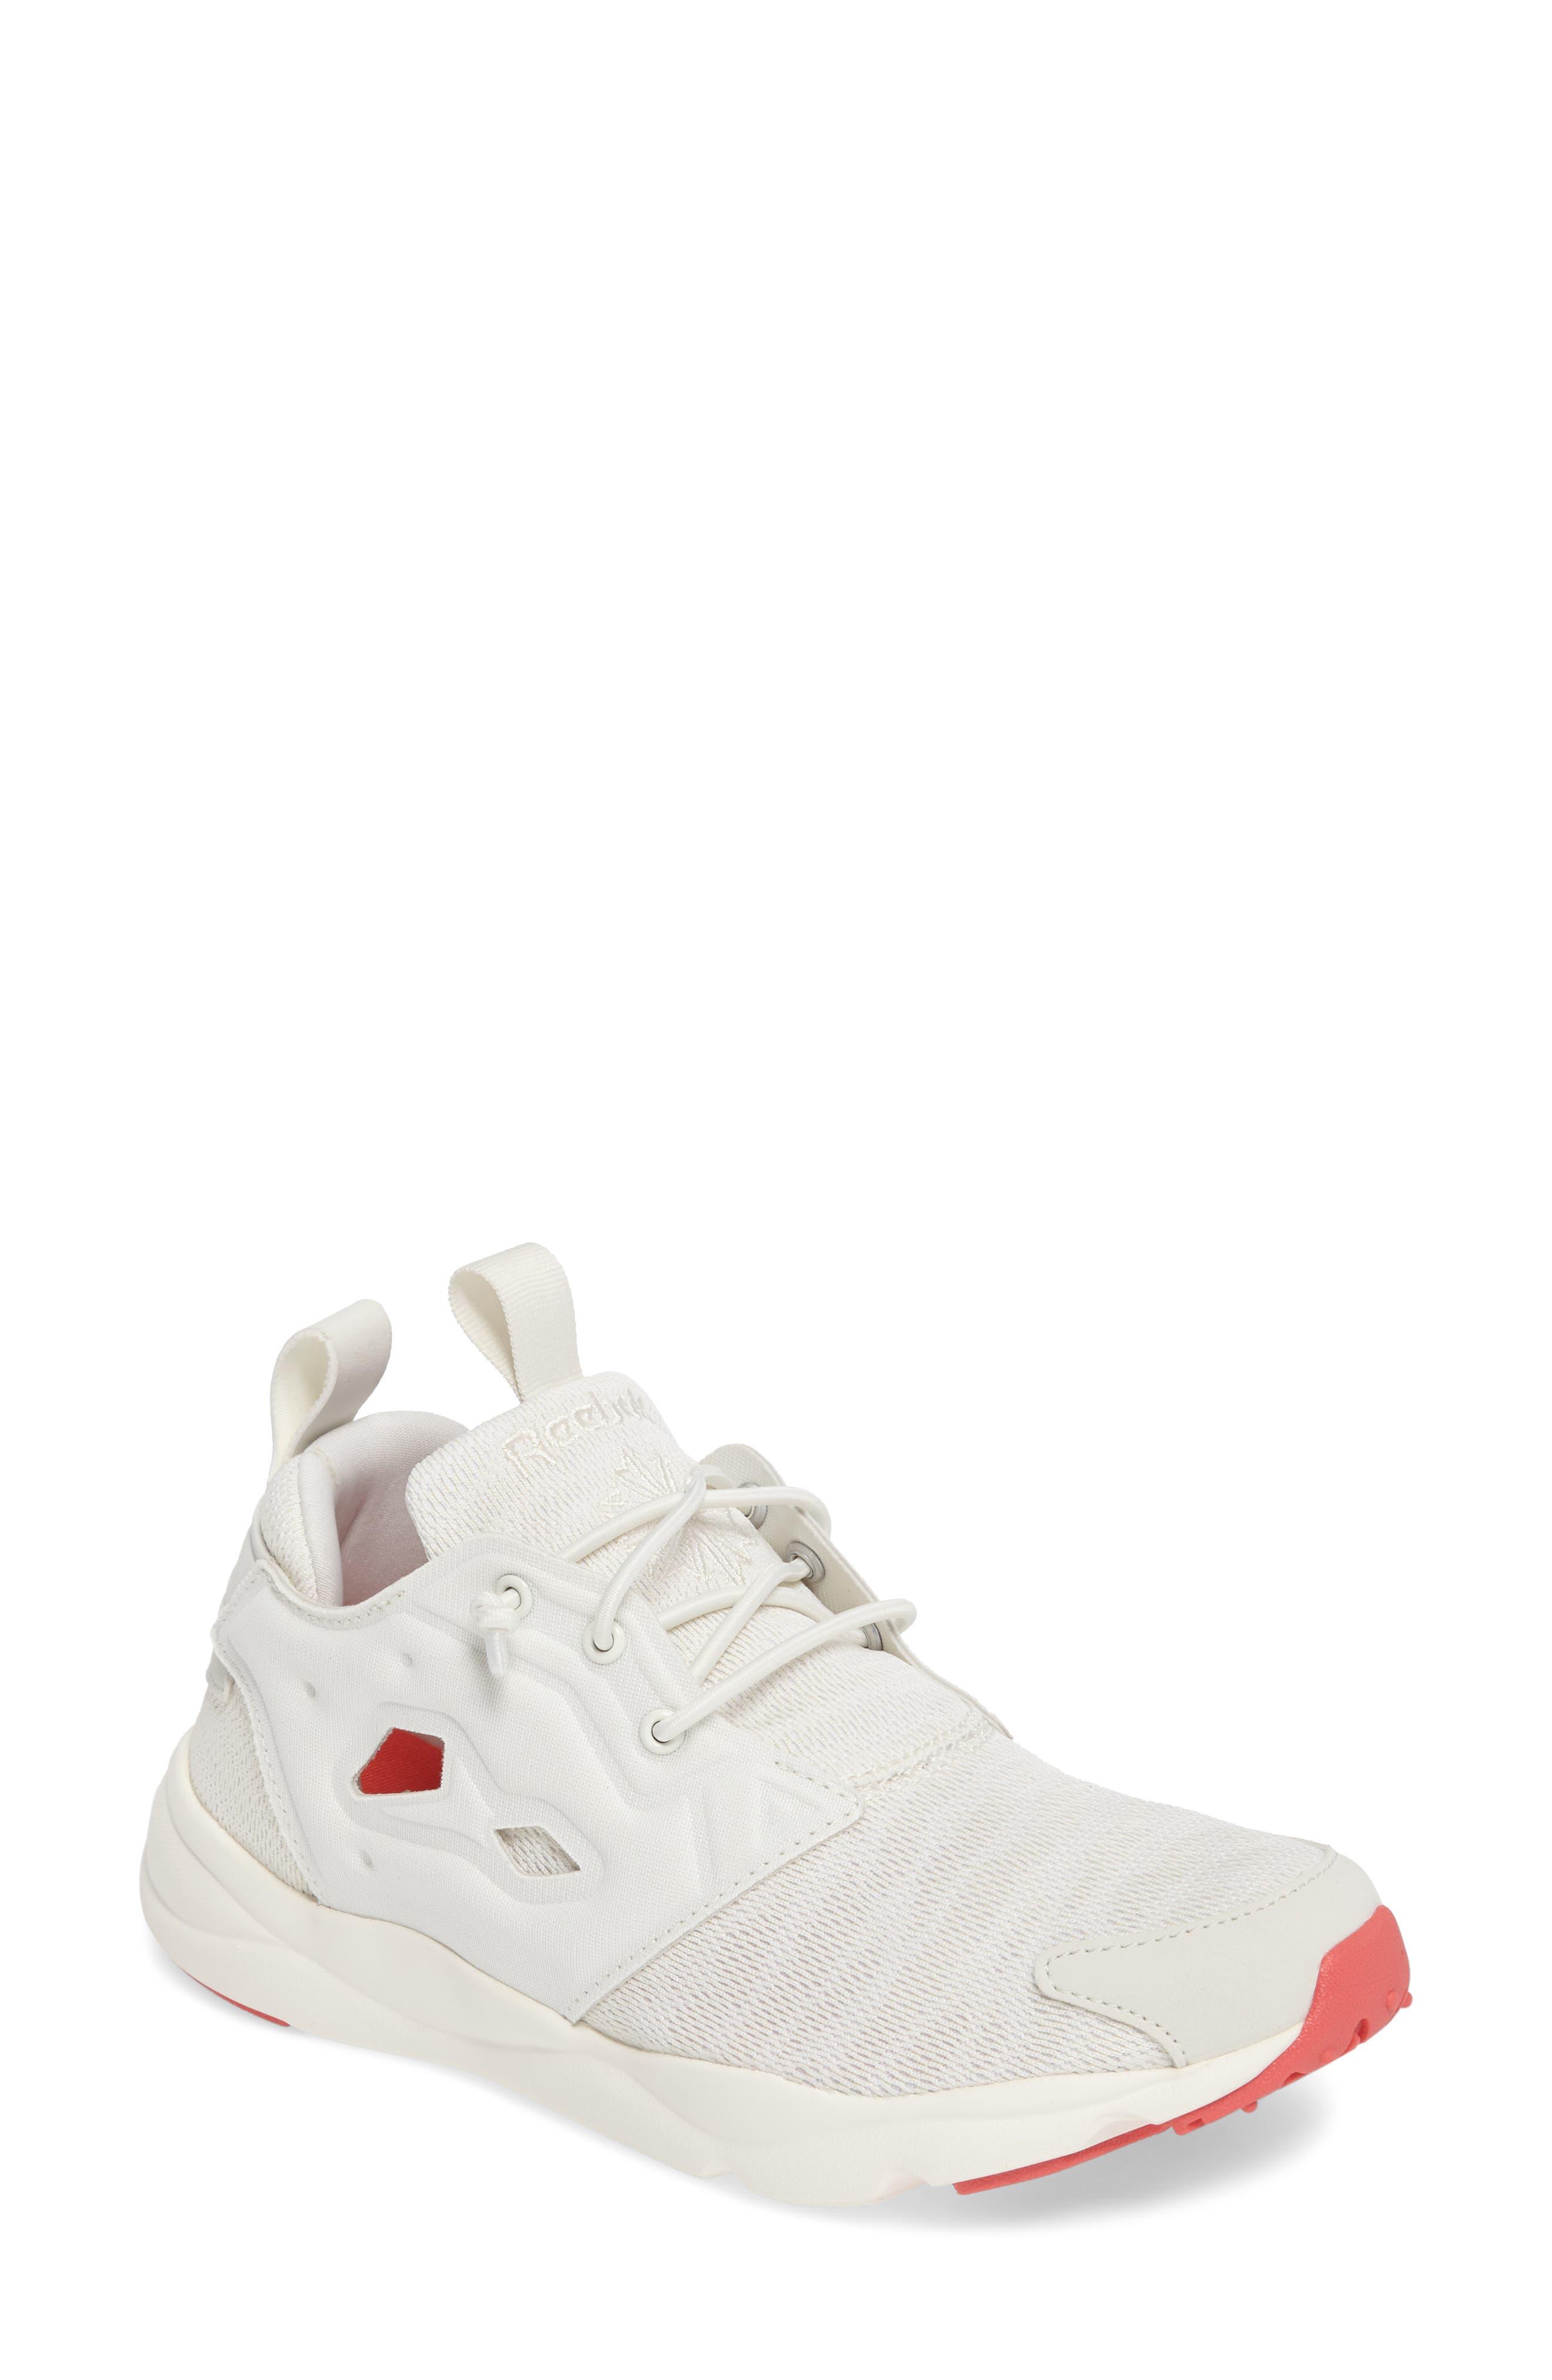 Alternate Image 1 Selected - Reebok Furylite Sneaker (Women)